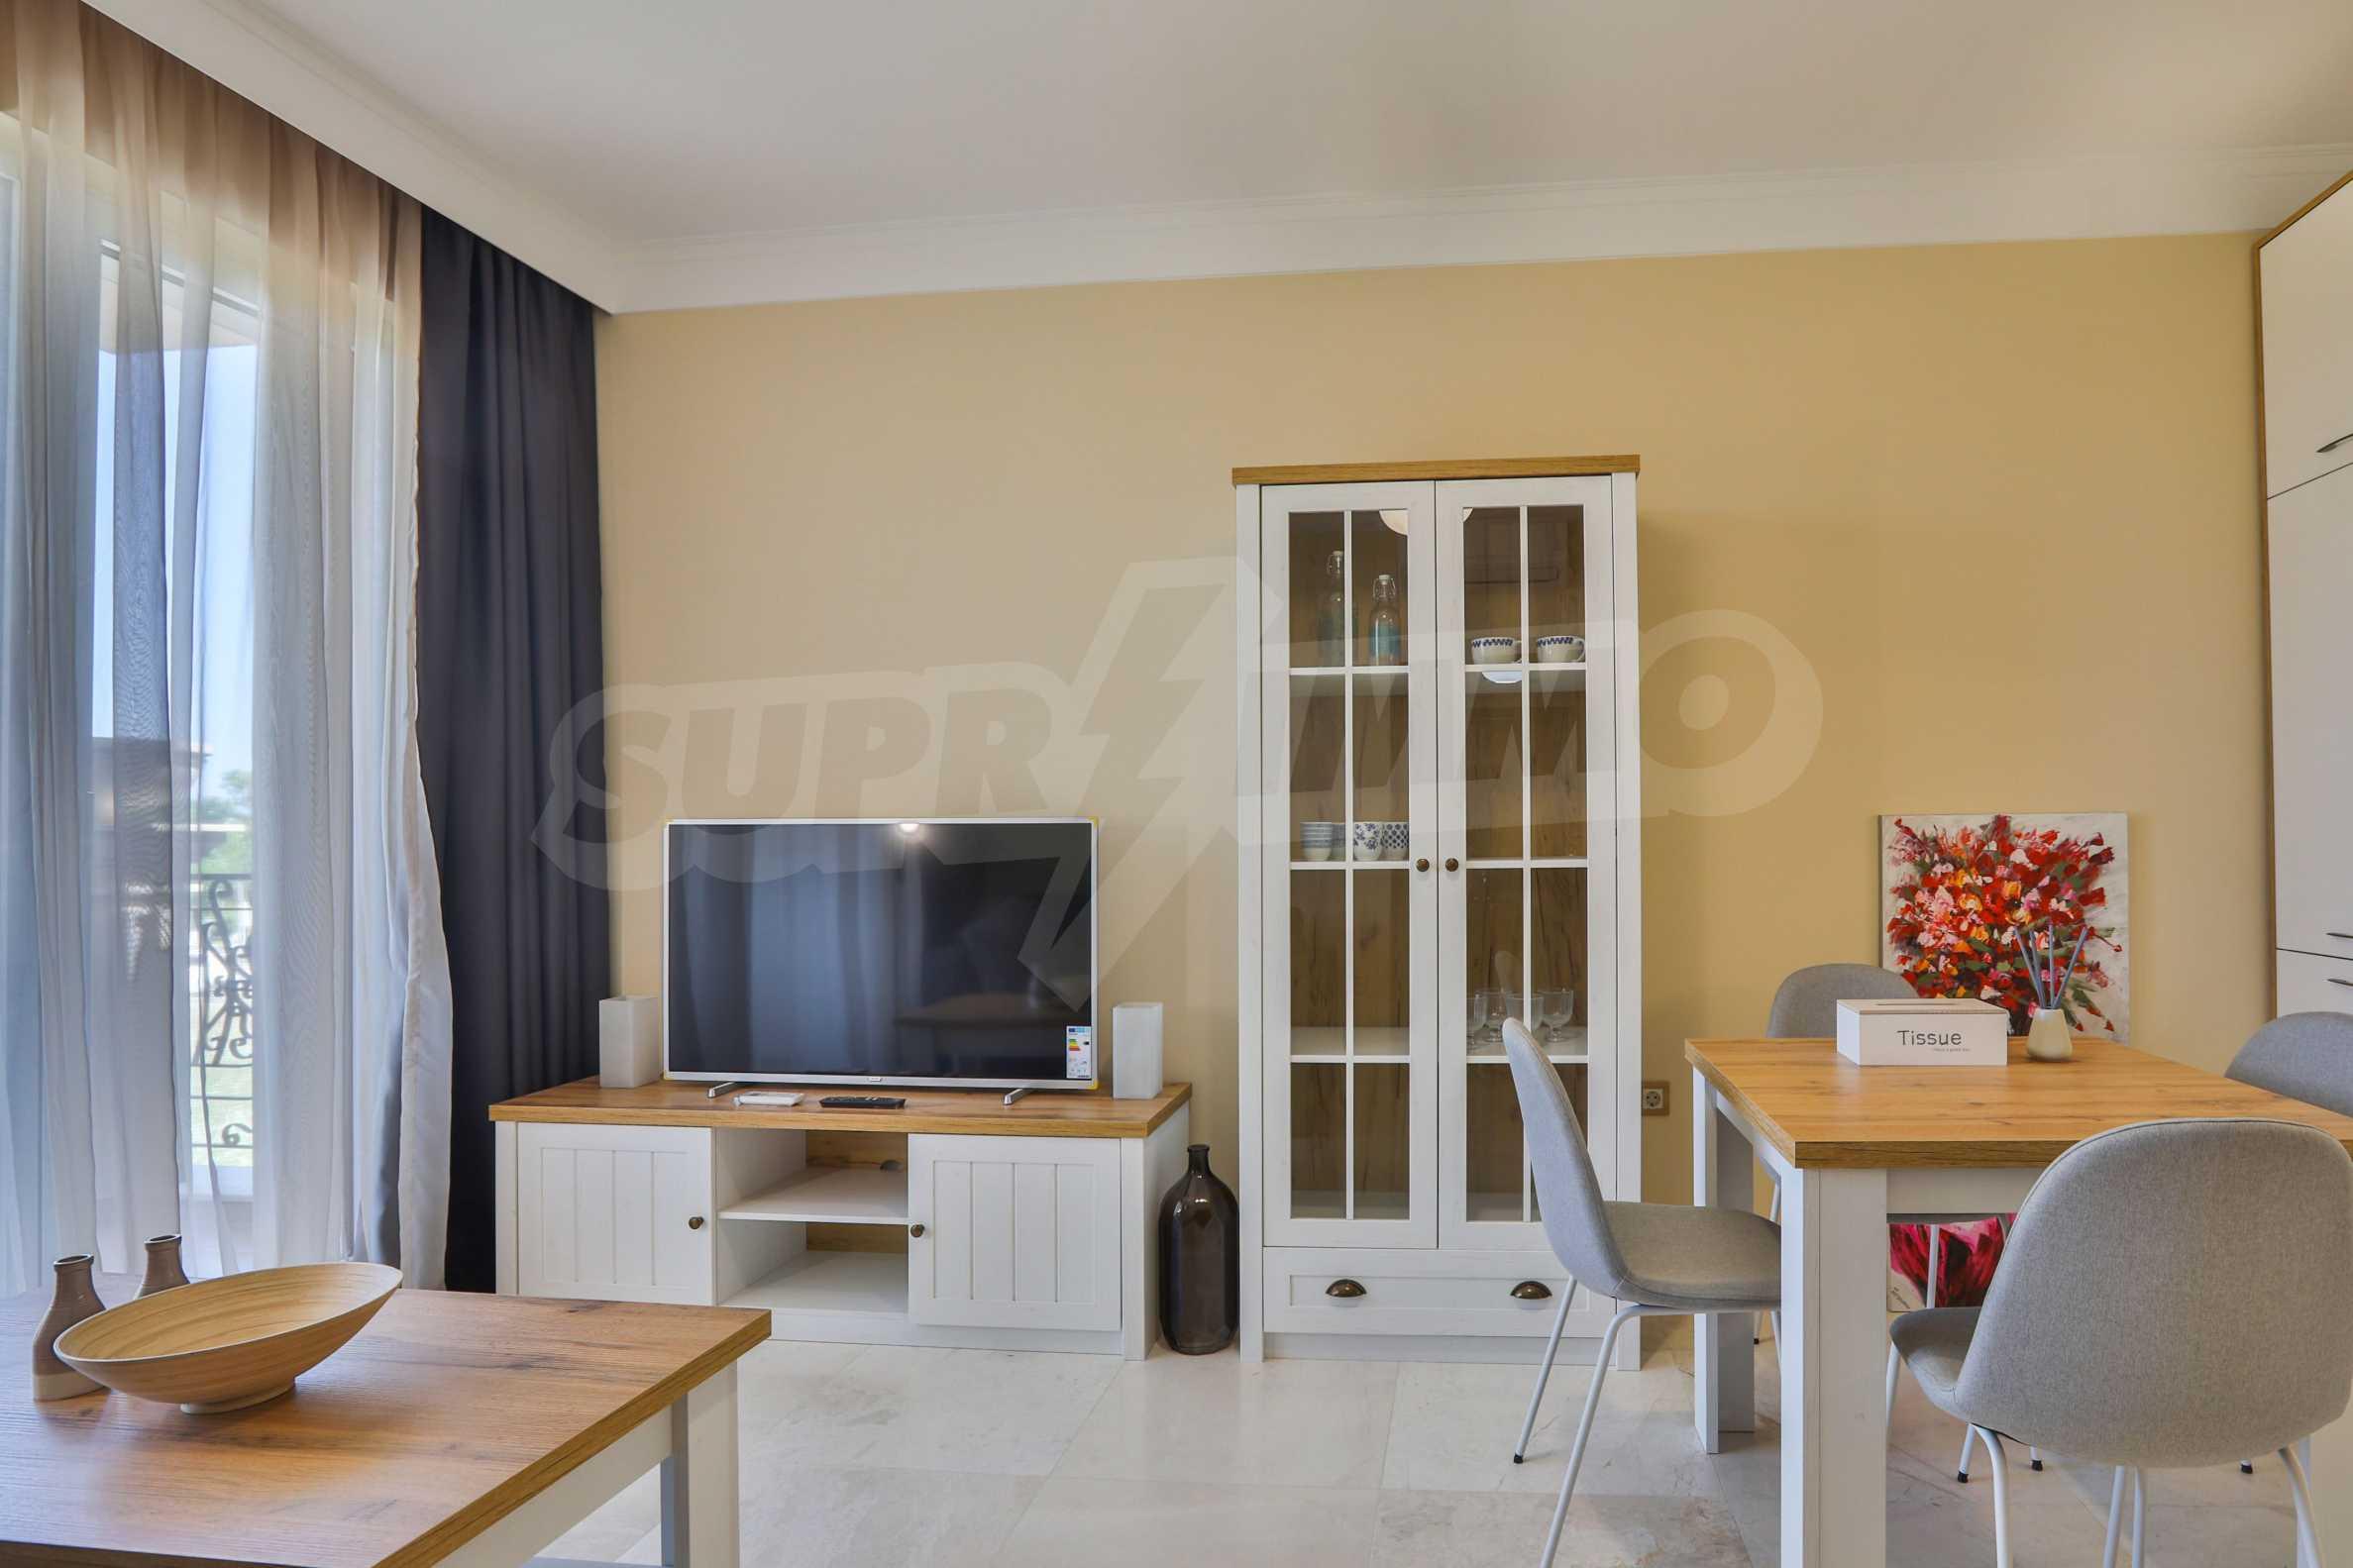 Първокласен двустаен апартамент в Belle Époque Beach Residence (ап. №A 206)